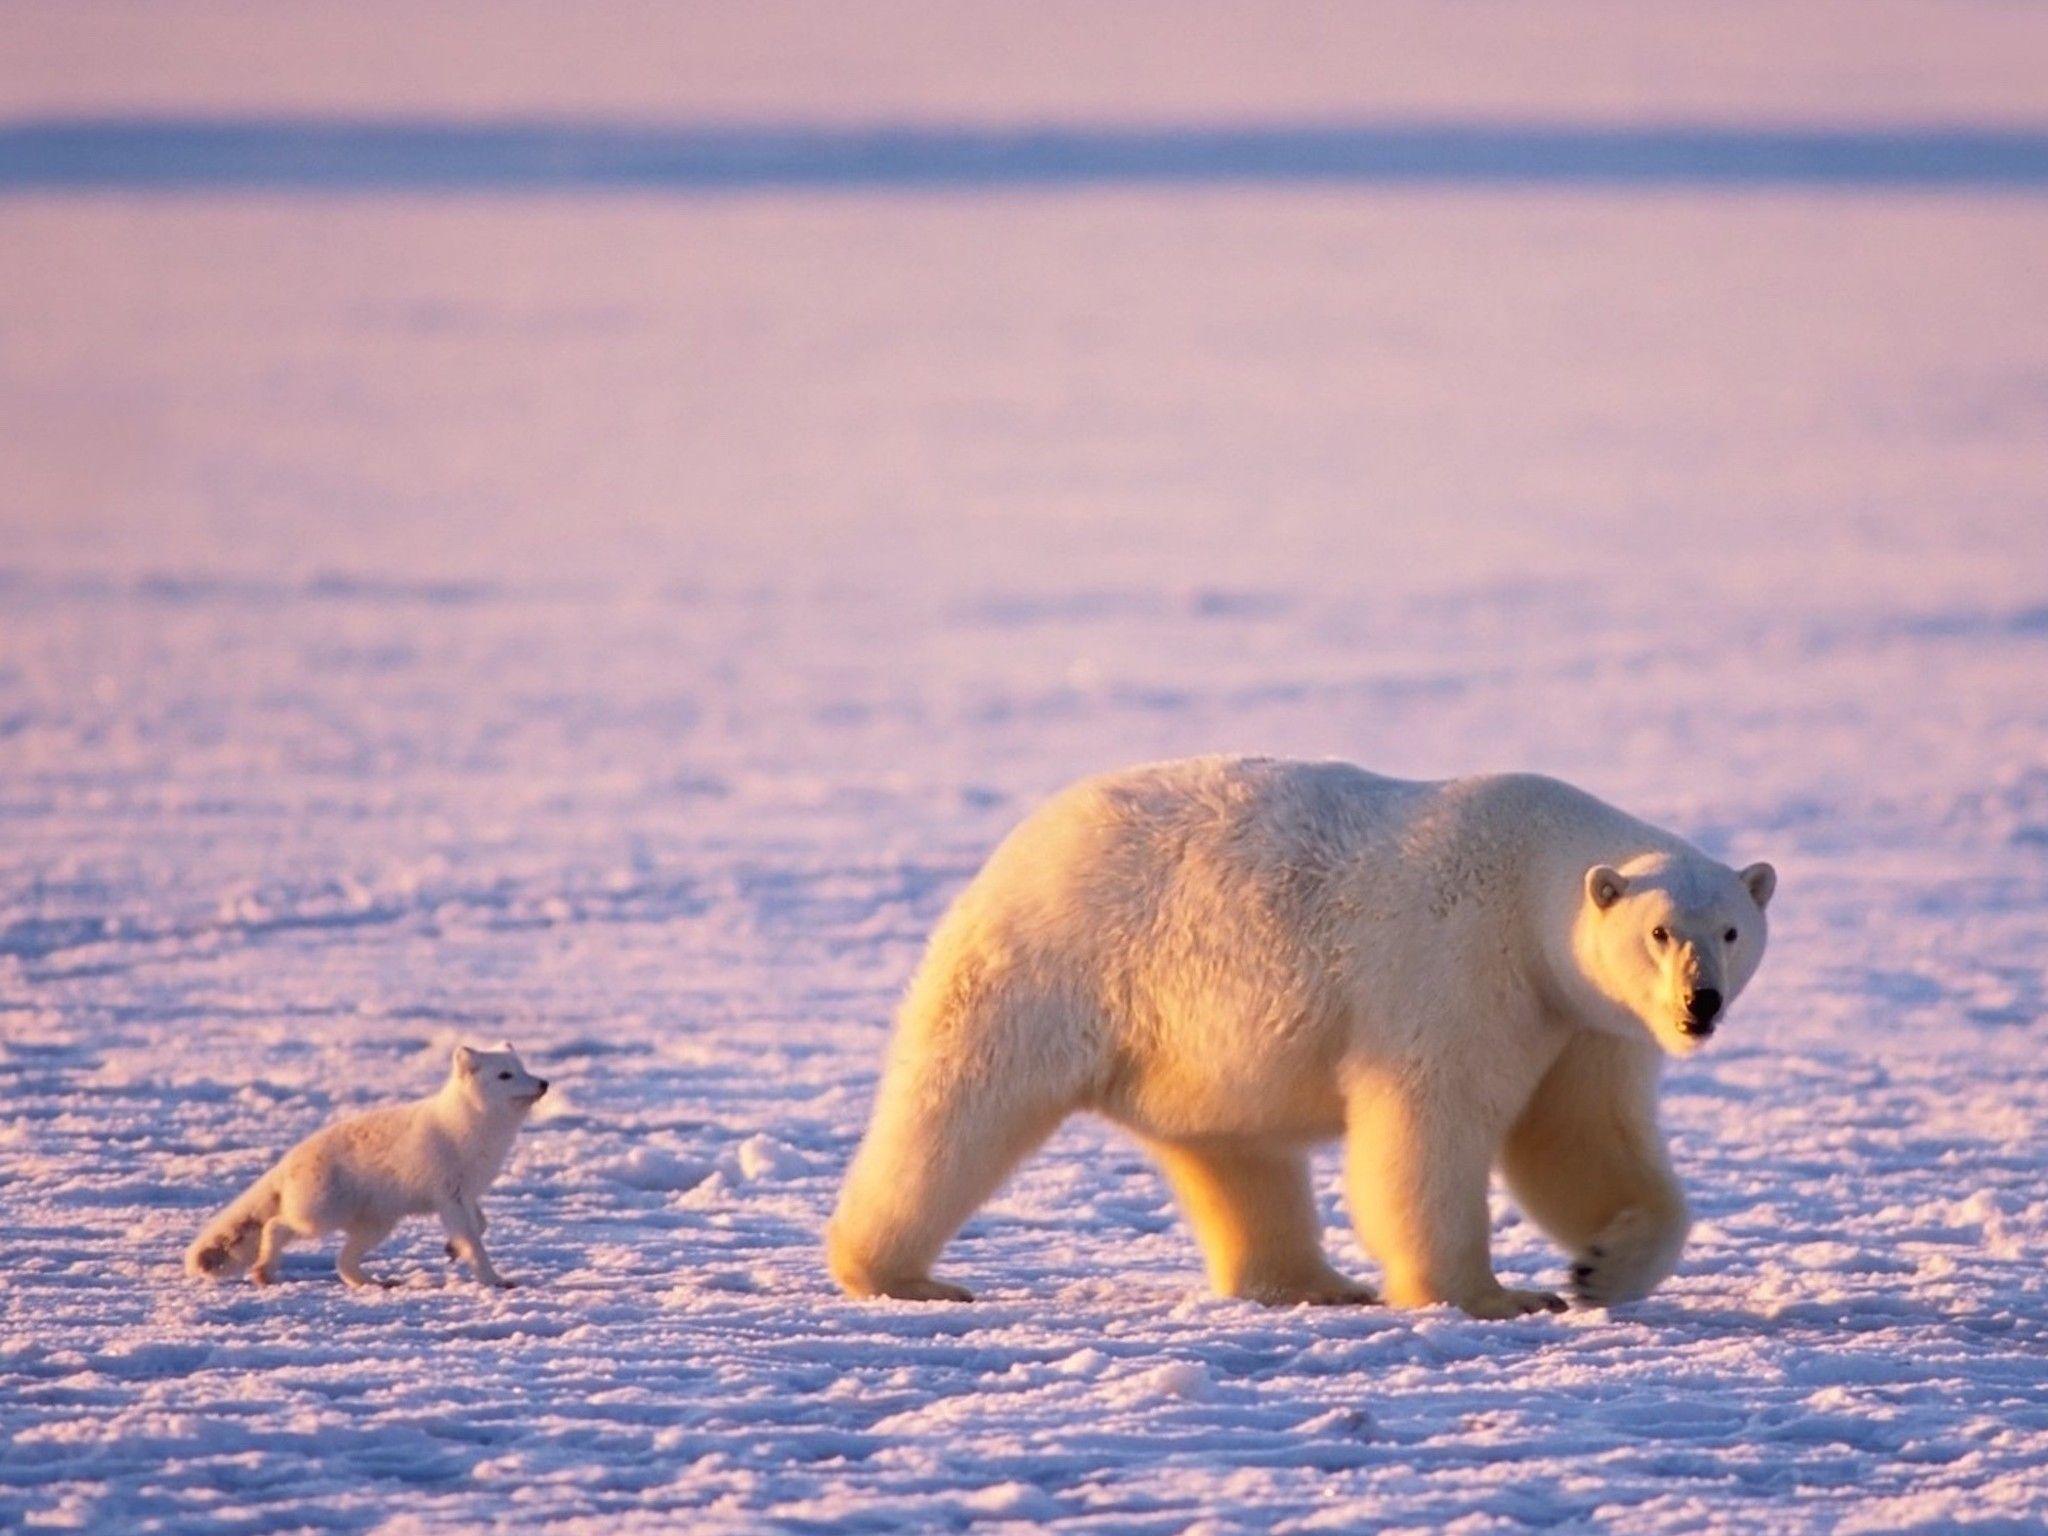 Arctic Friends Wallpaper Polar Bear Wallpaper Polar Bear Polar Bear Facts